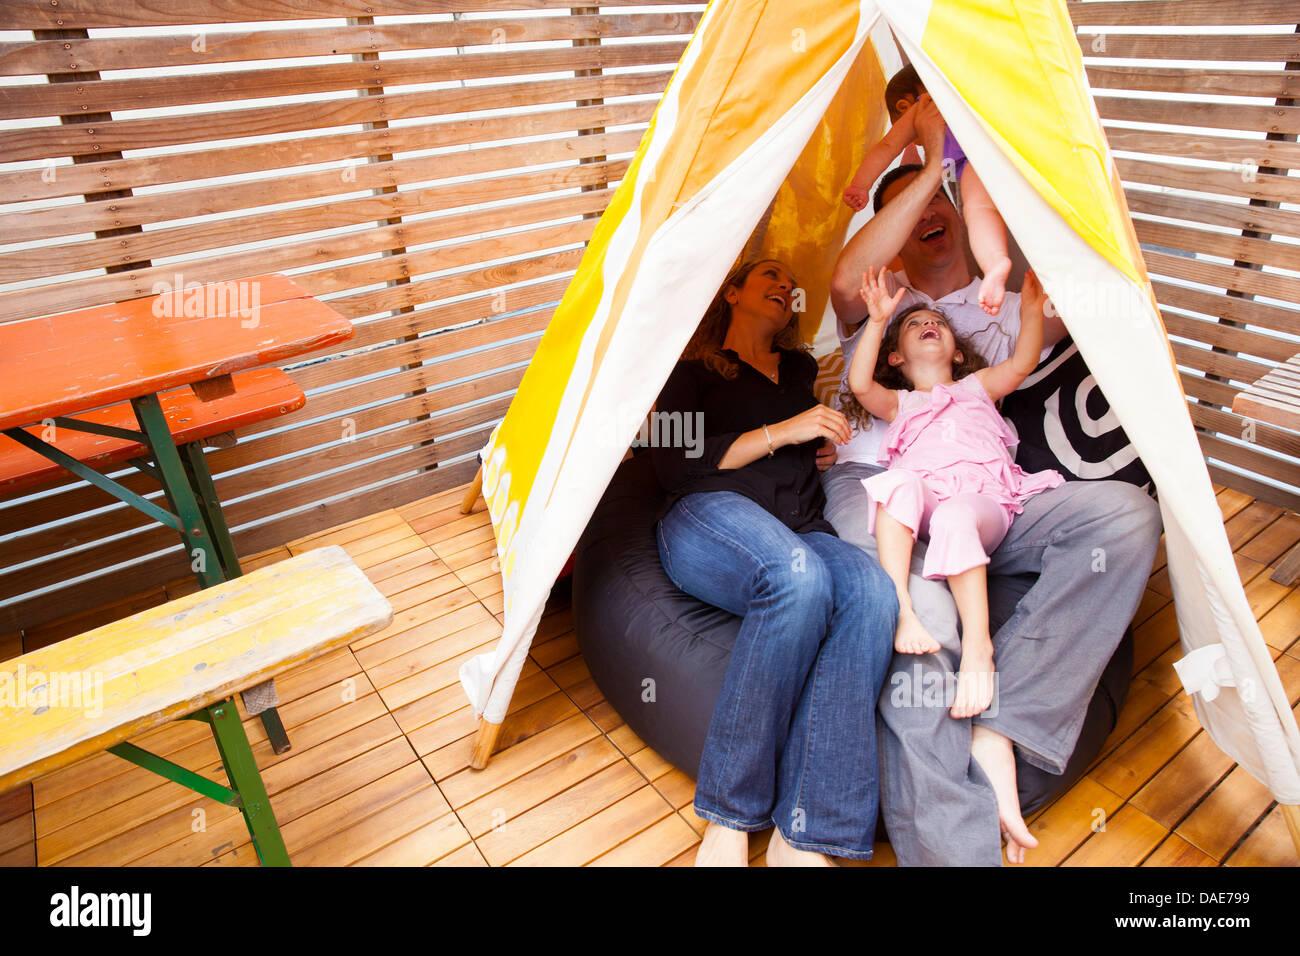 Jugar en familia carpa Imagen De Stock